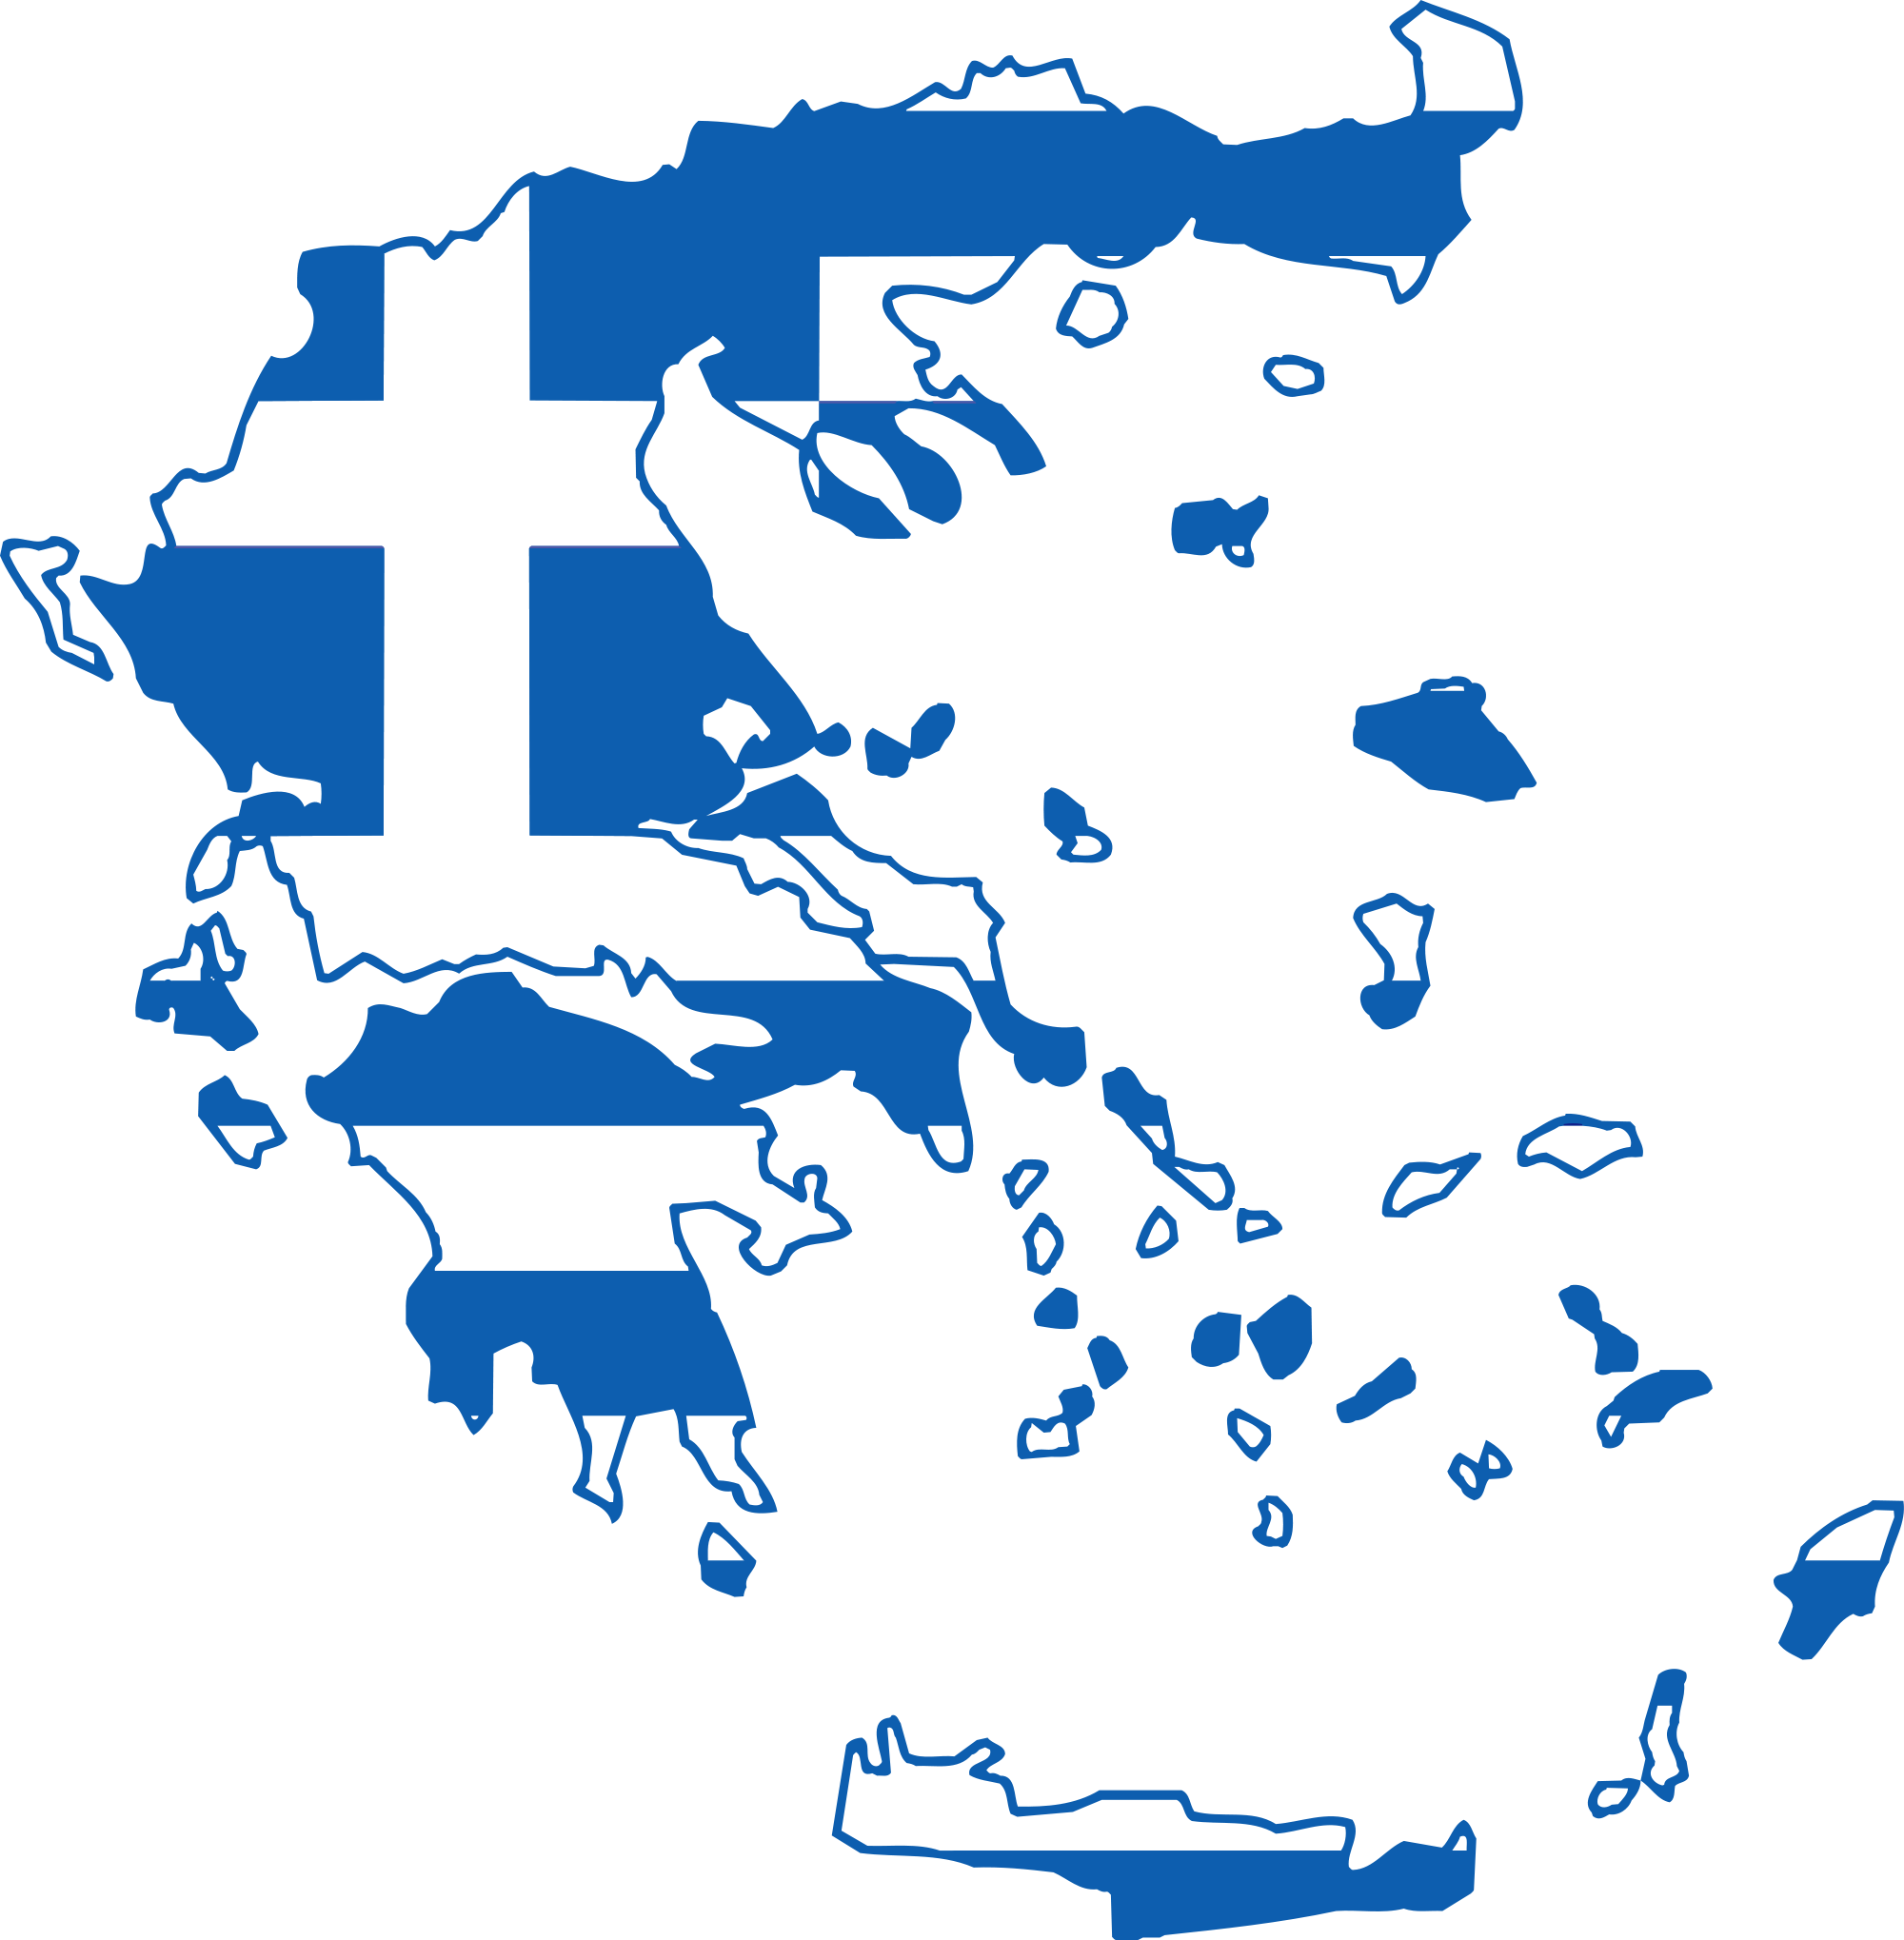 Axfone Greece